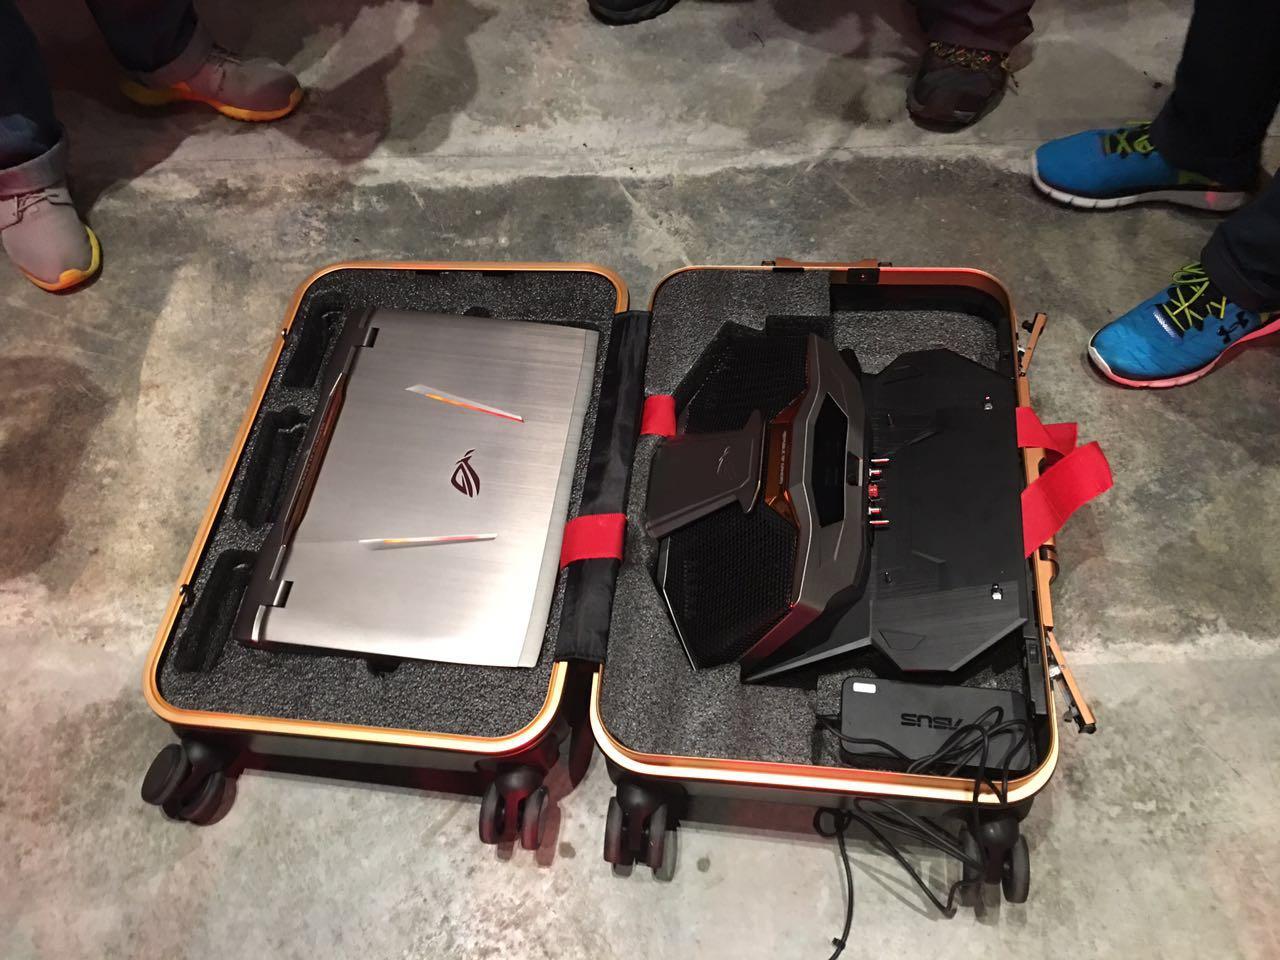 luggage ASUS ROG GX700 opened